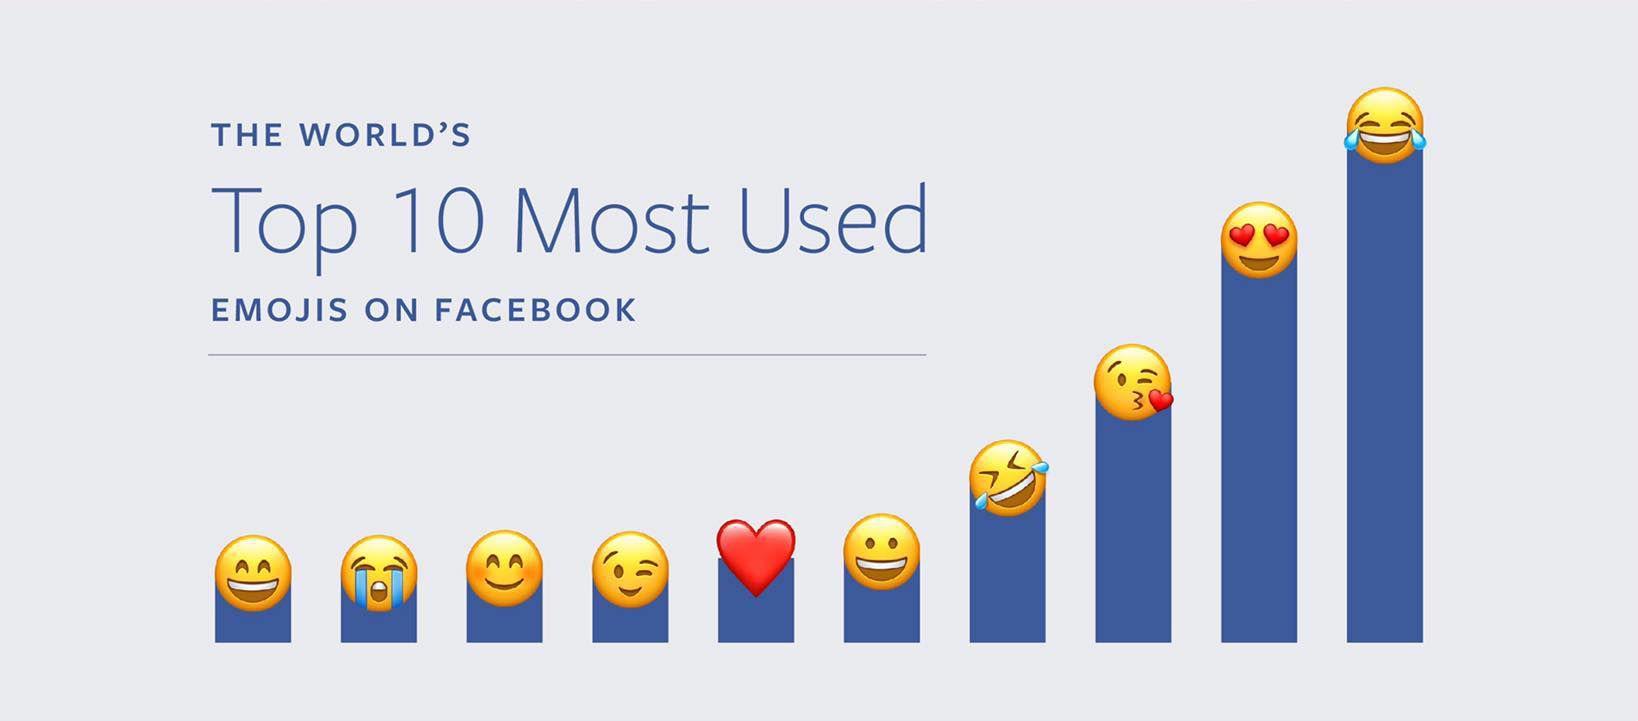 A screenshot of Mark Zuckerberg's Emojis on Facebook Infographic.